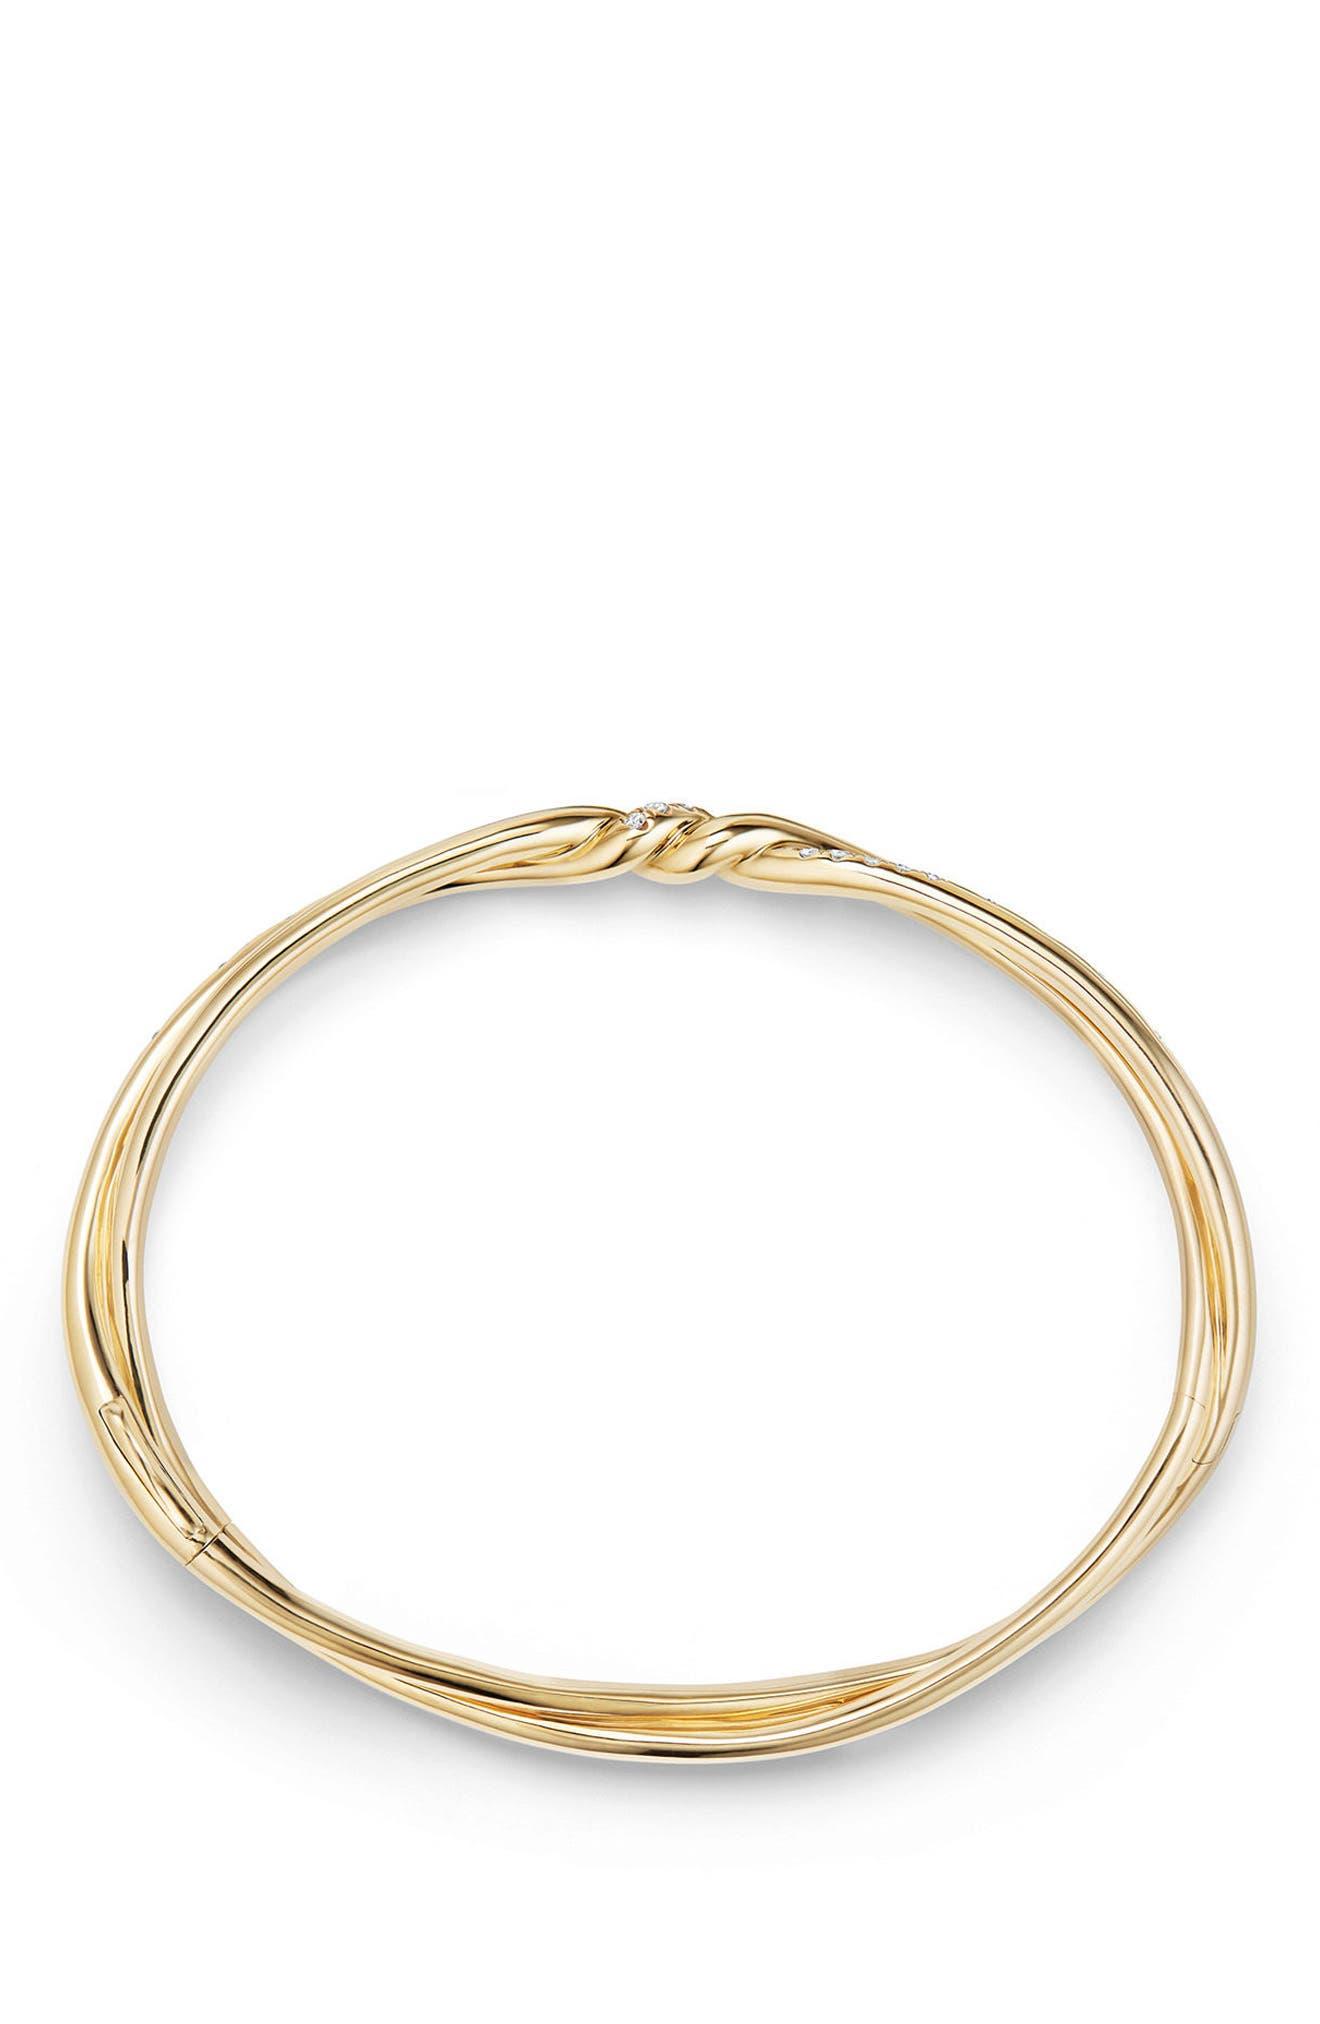 Continuance Center Twist 18K Gold Bracelet with Diamonds,                             Alternate thumbnail 2, color,                             YELLOW GOLD